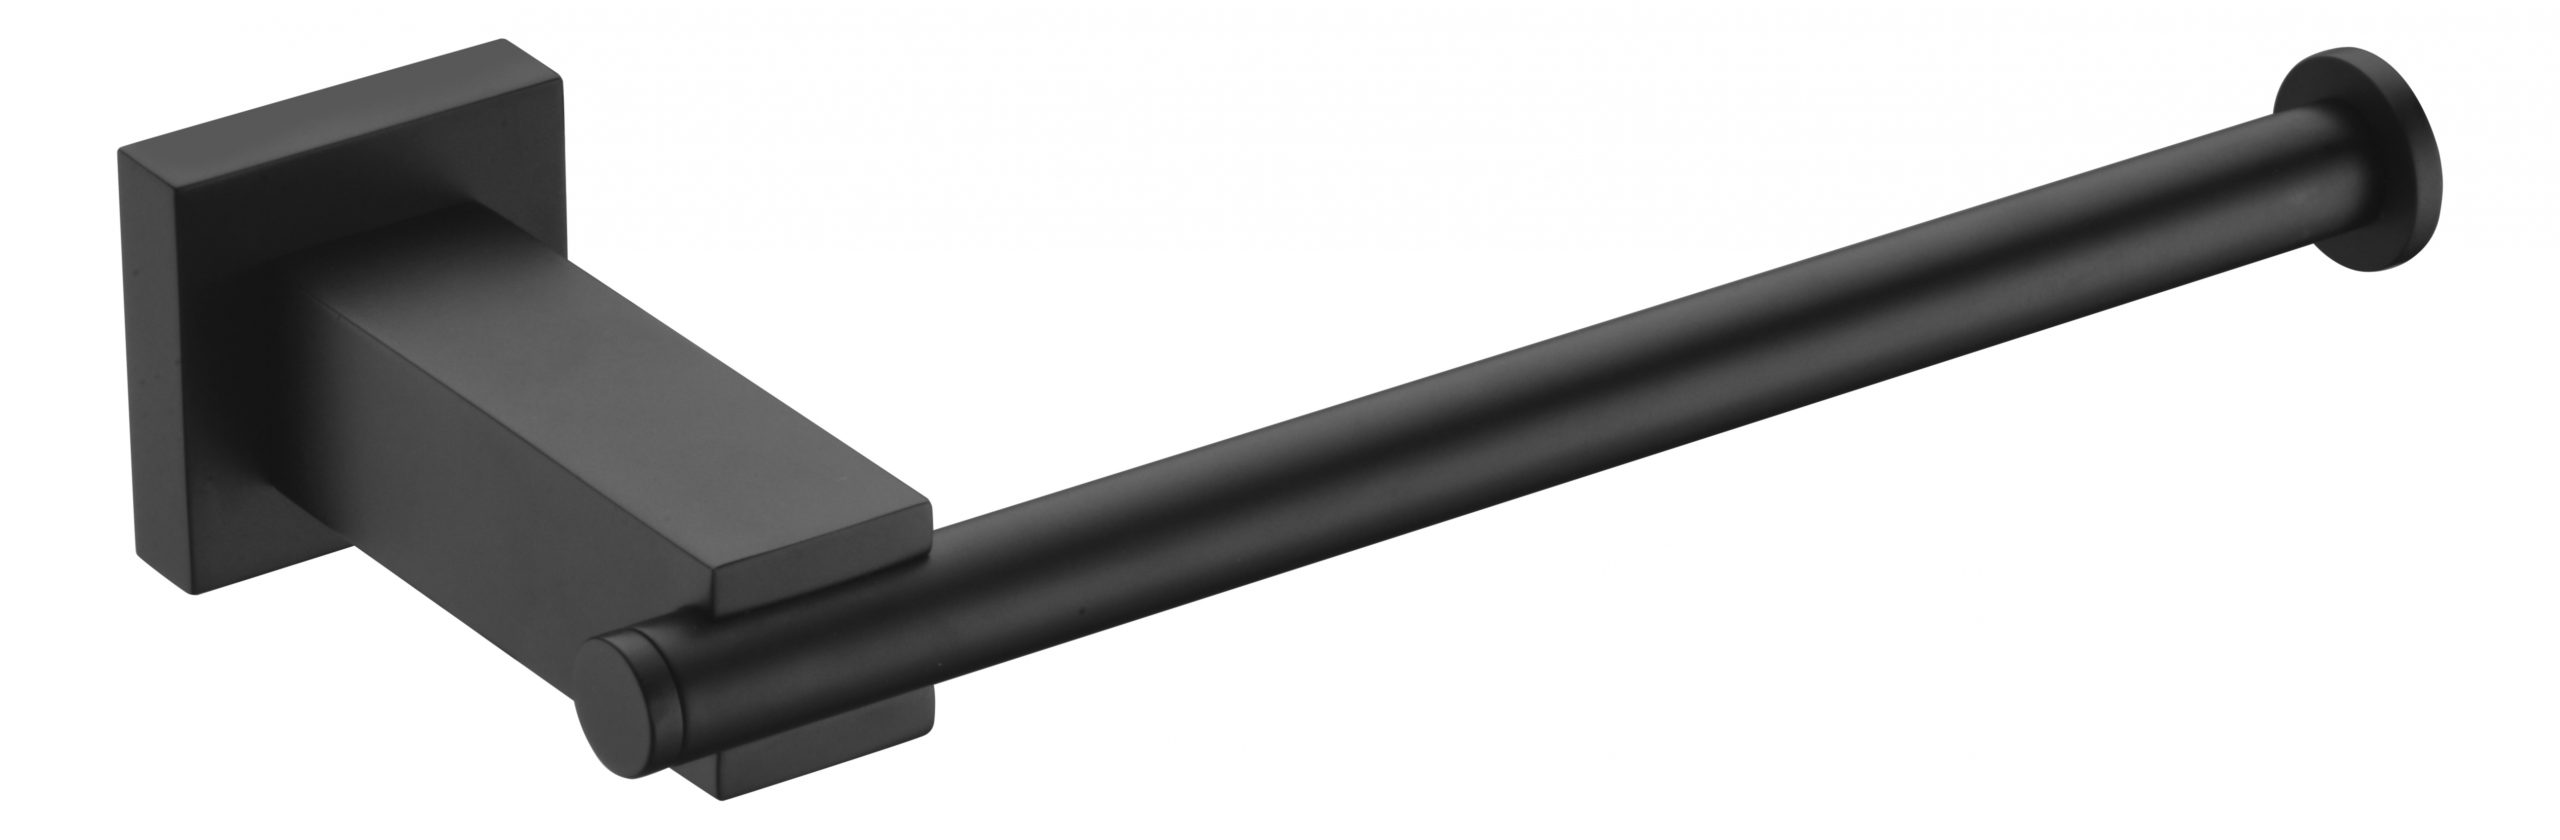 HDP705-B Black Towel Rail